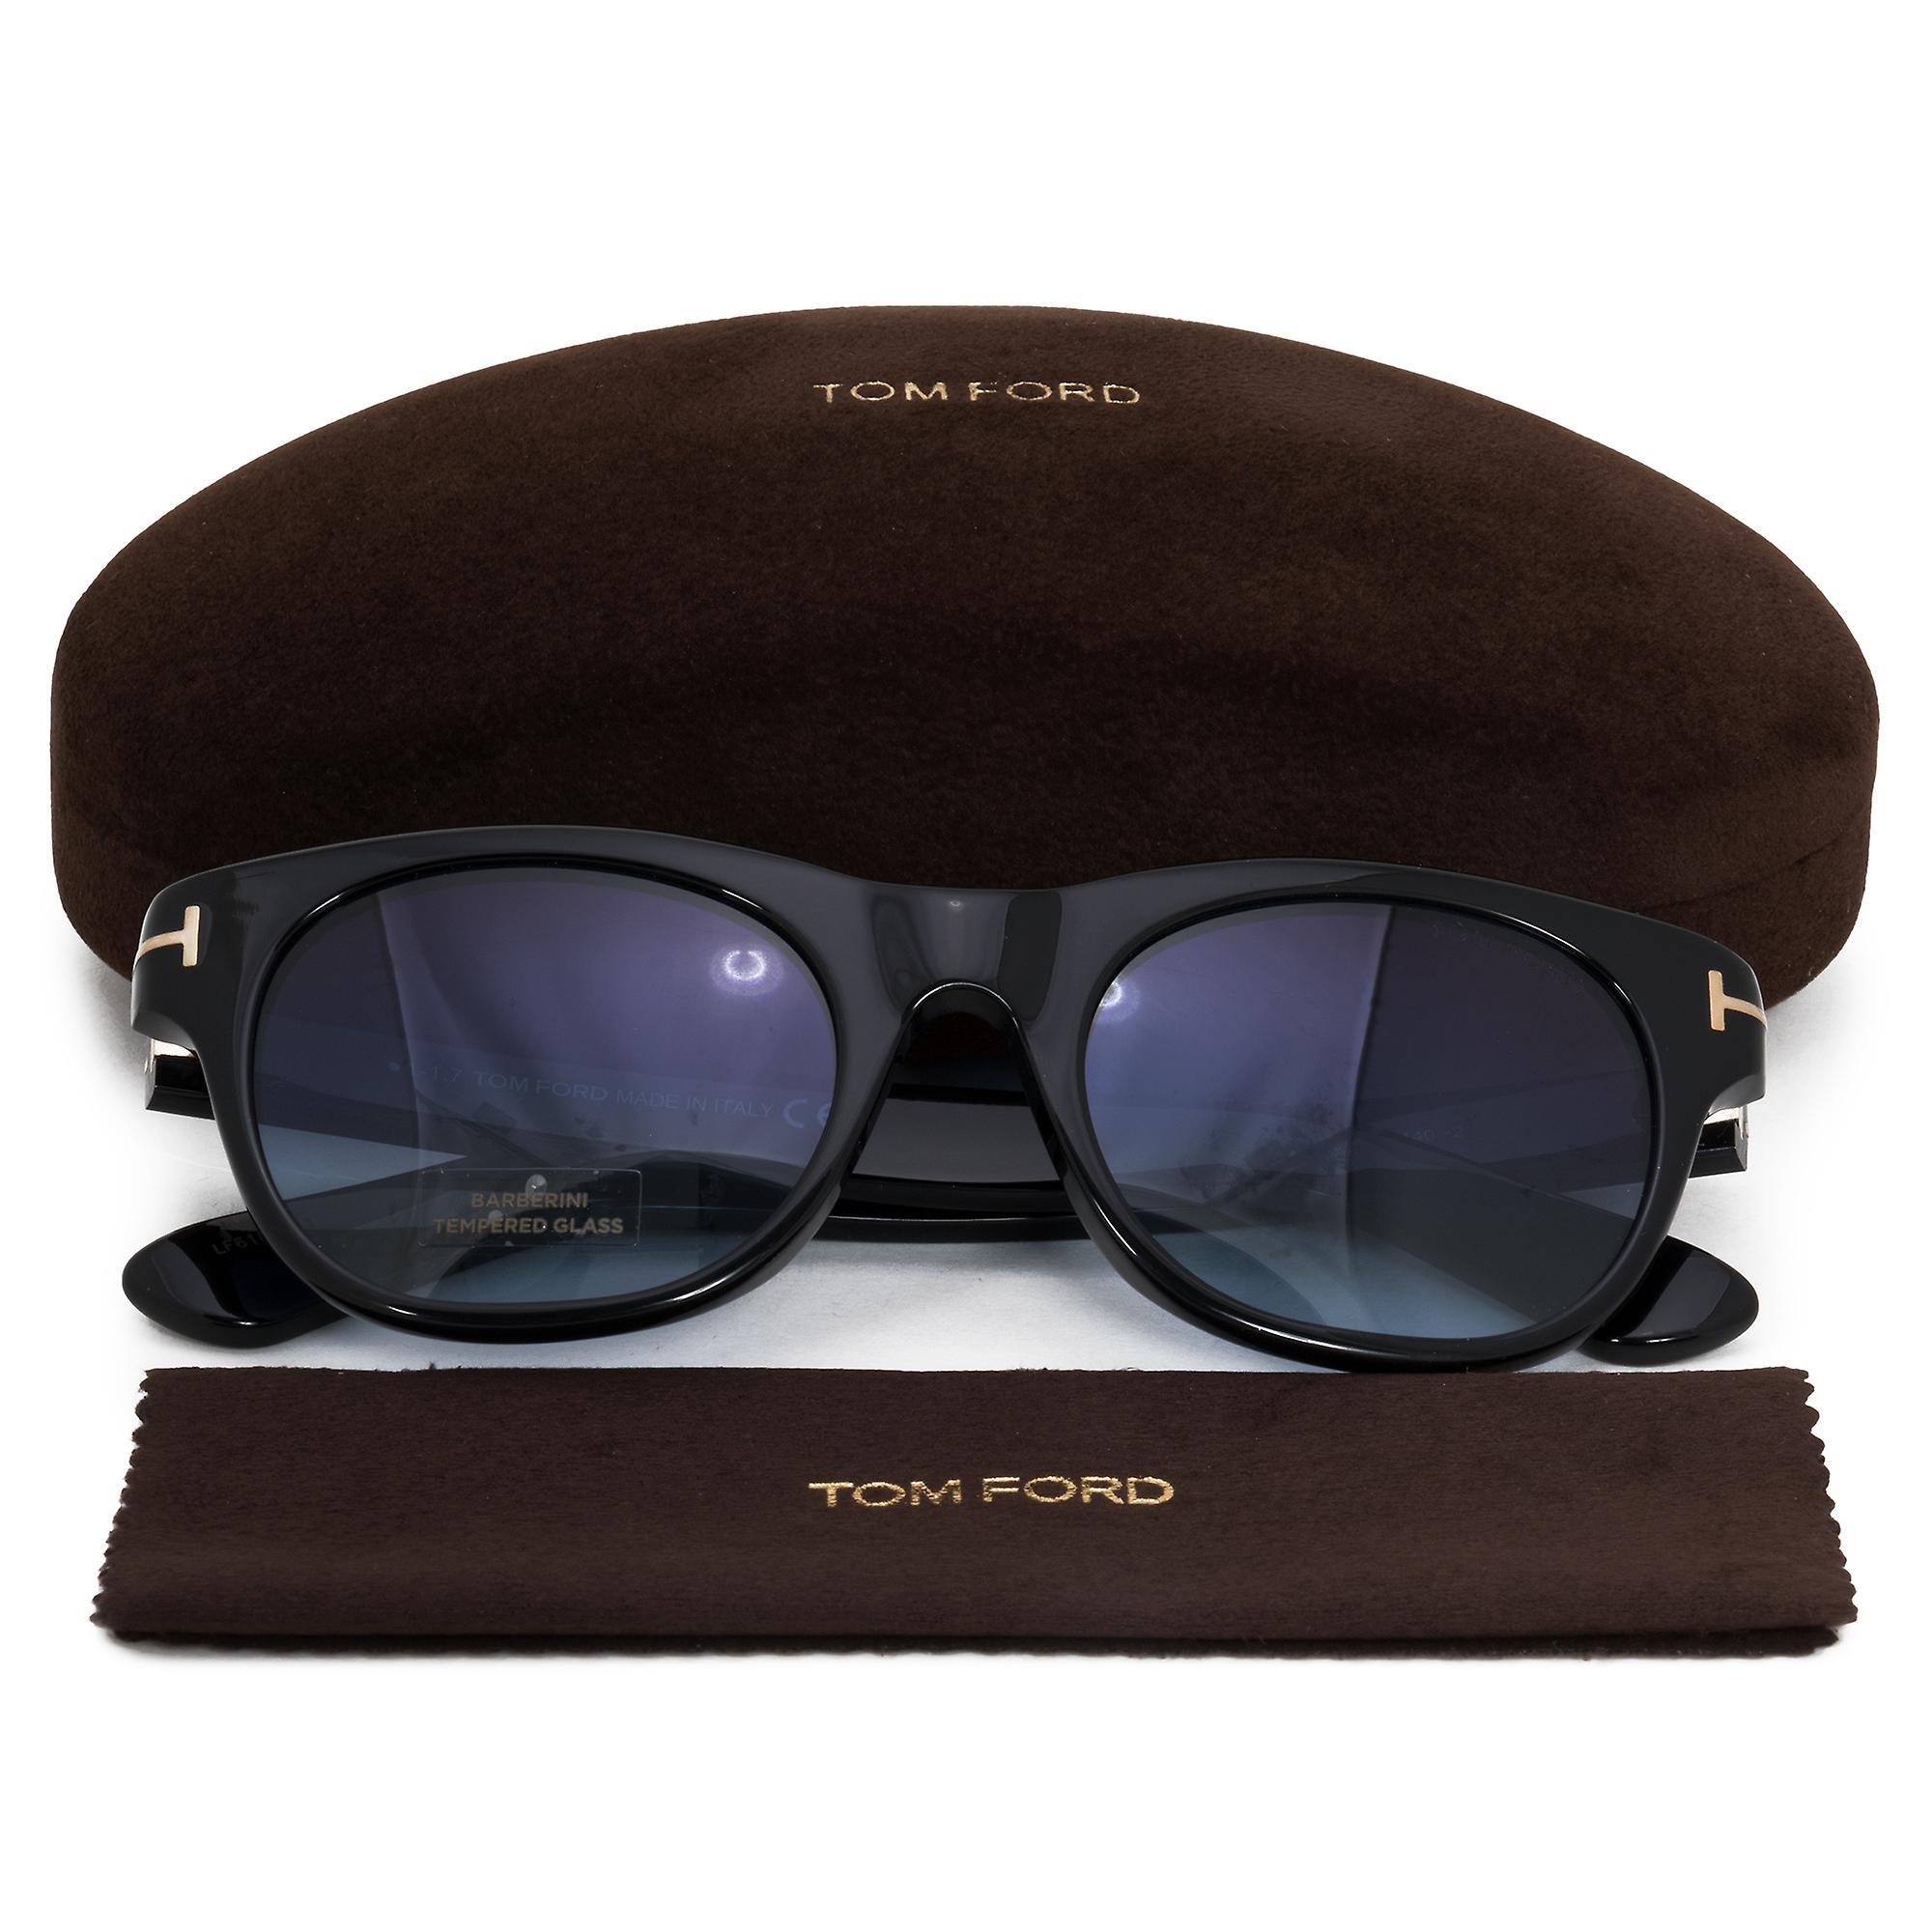 Tom Ford Alley Oval Sunglasses FT0532 01W 51 | Black Acetate Frames | Blue Gradient Lenses